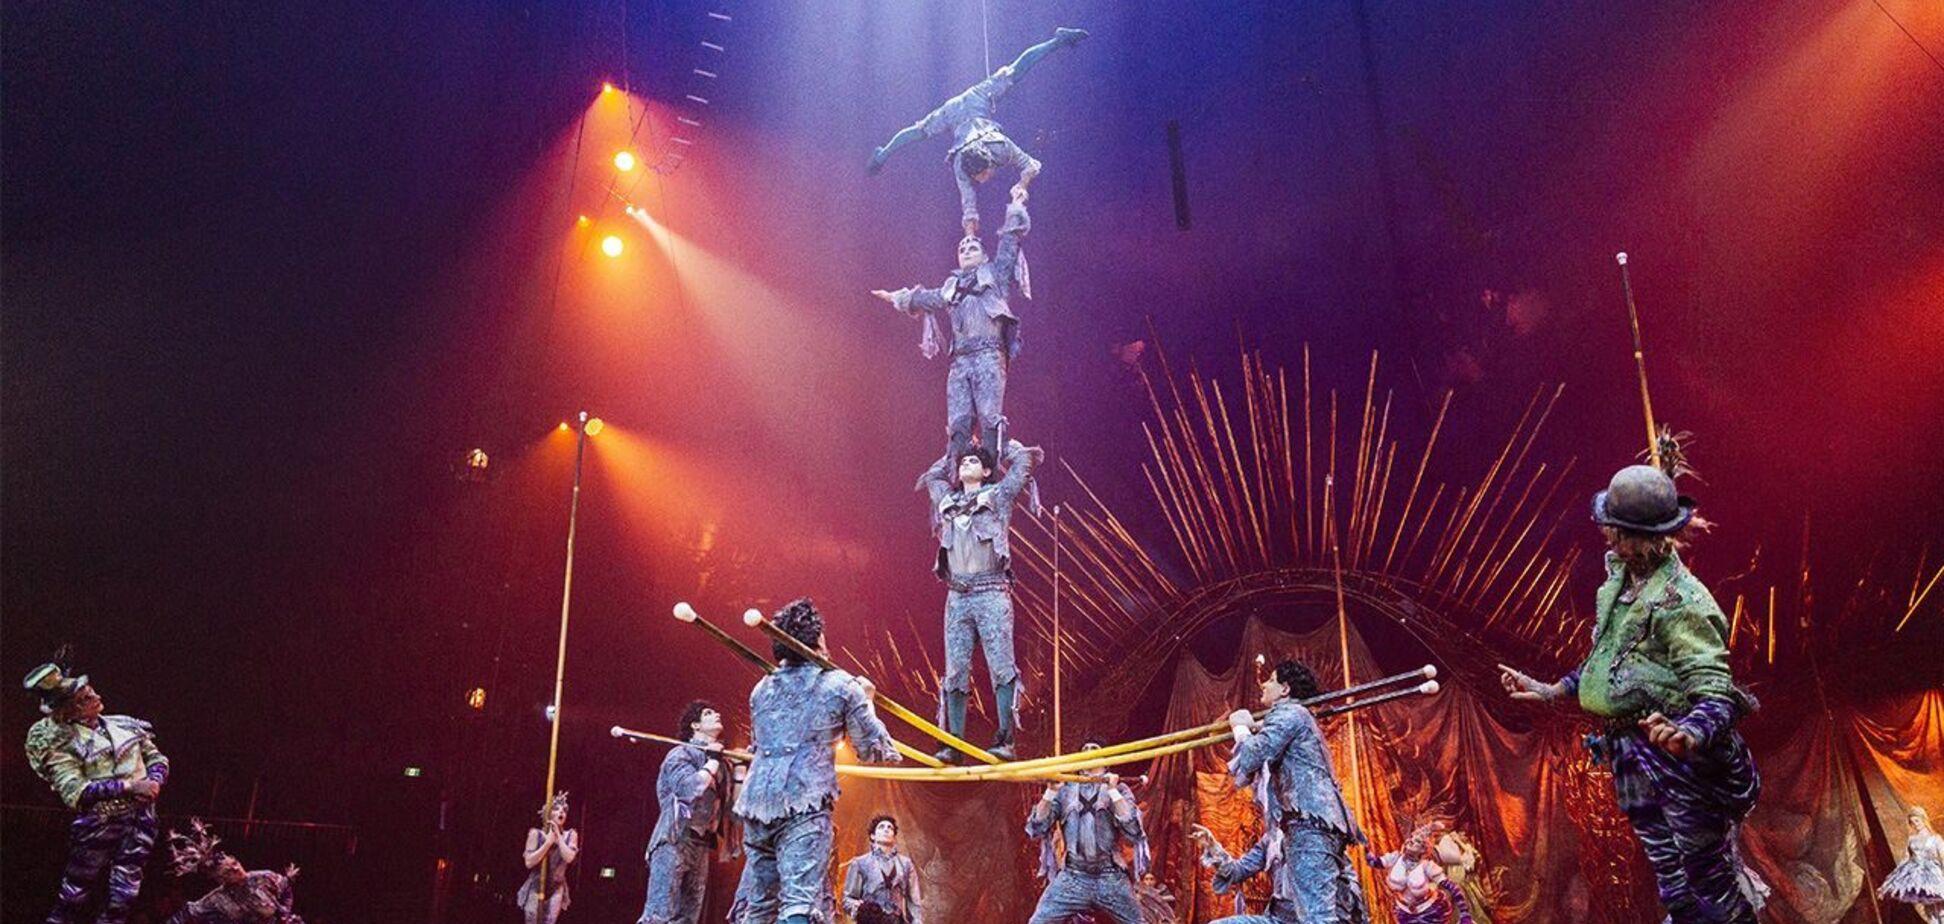 Цирк 'Дю Солей' оголосив про банкрутство